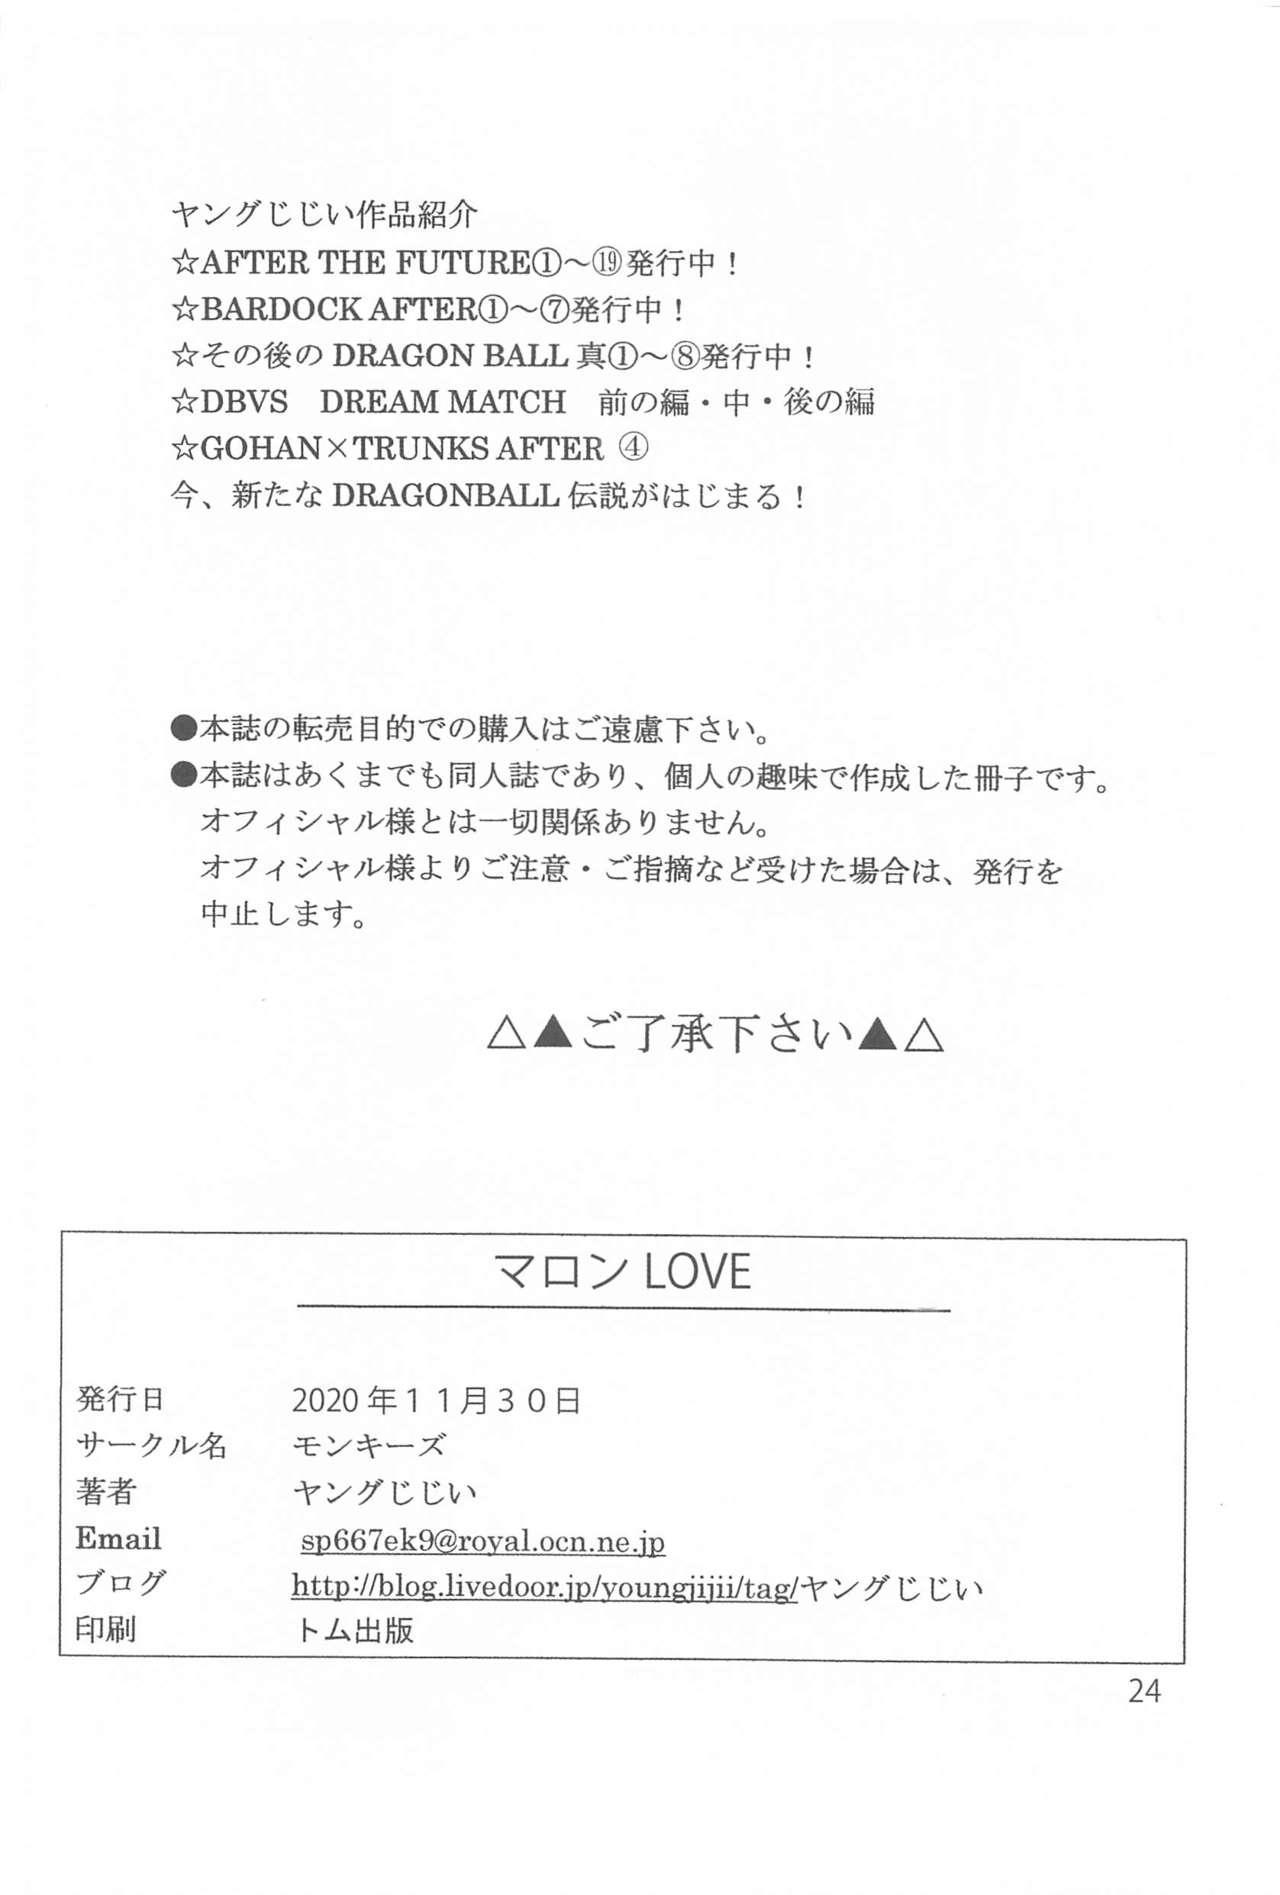 Maron LOVE 24